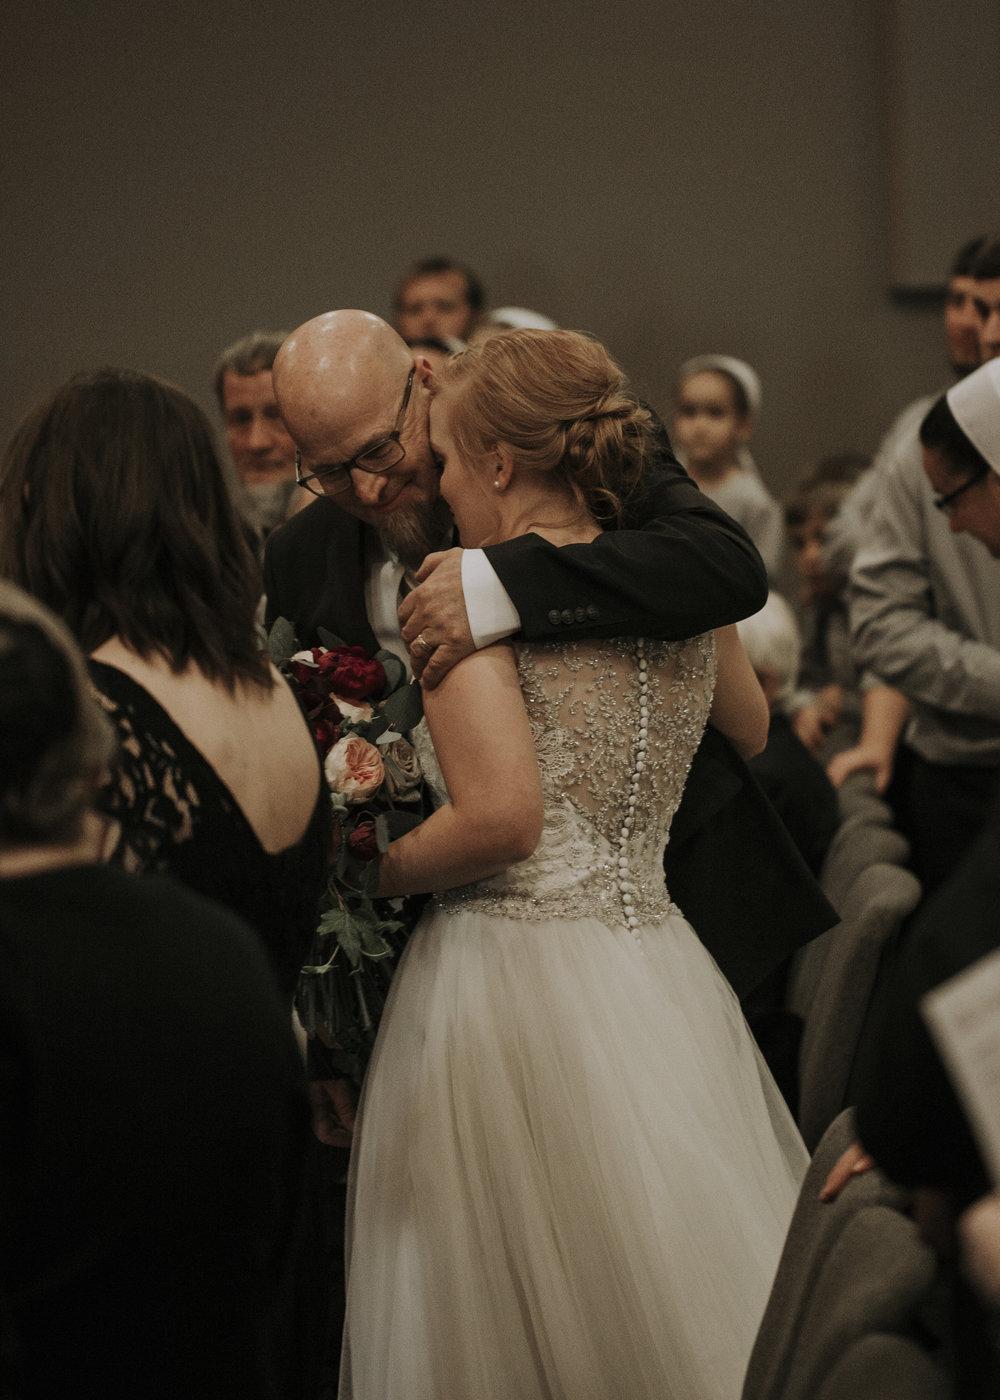 justin-and-lachelle-wedding-263.jpg